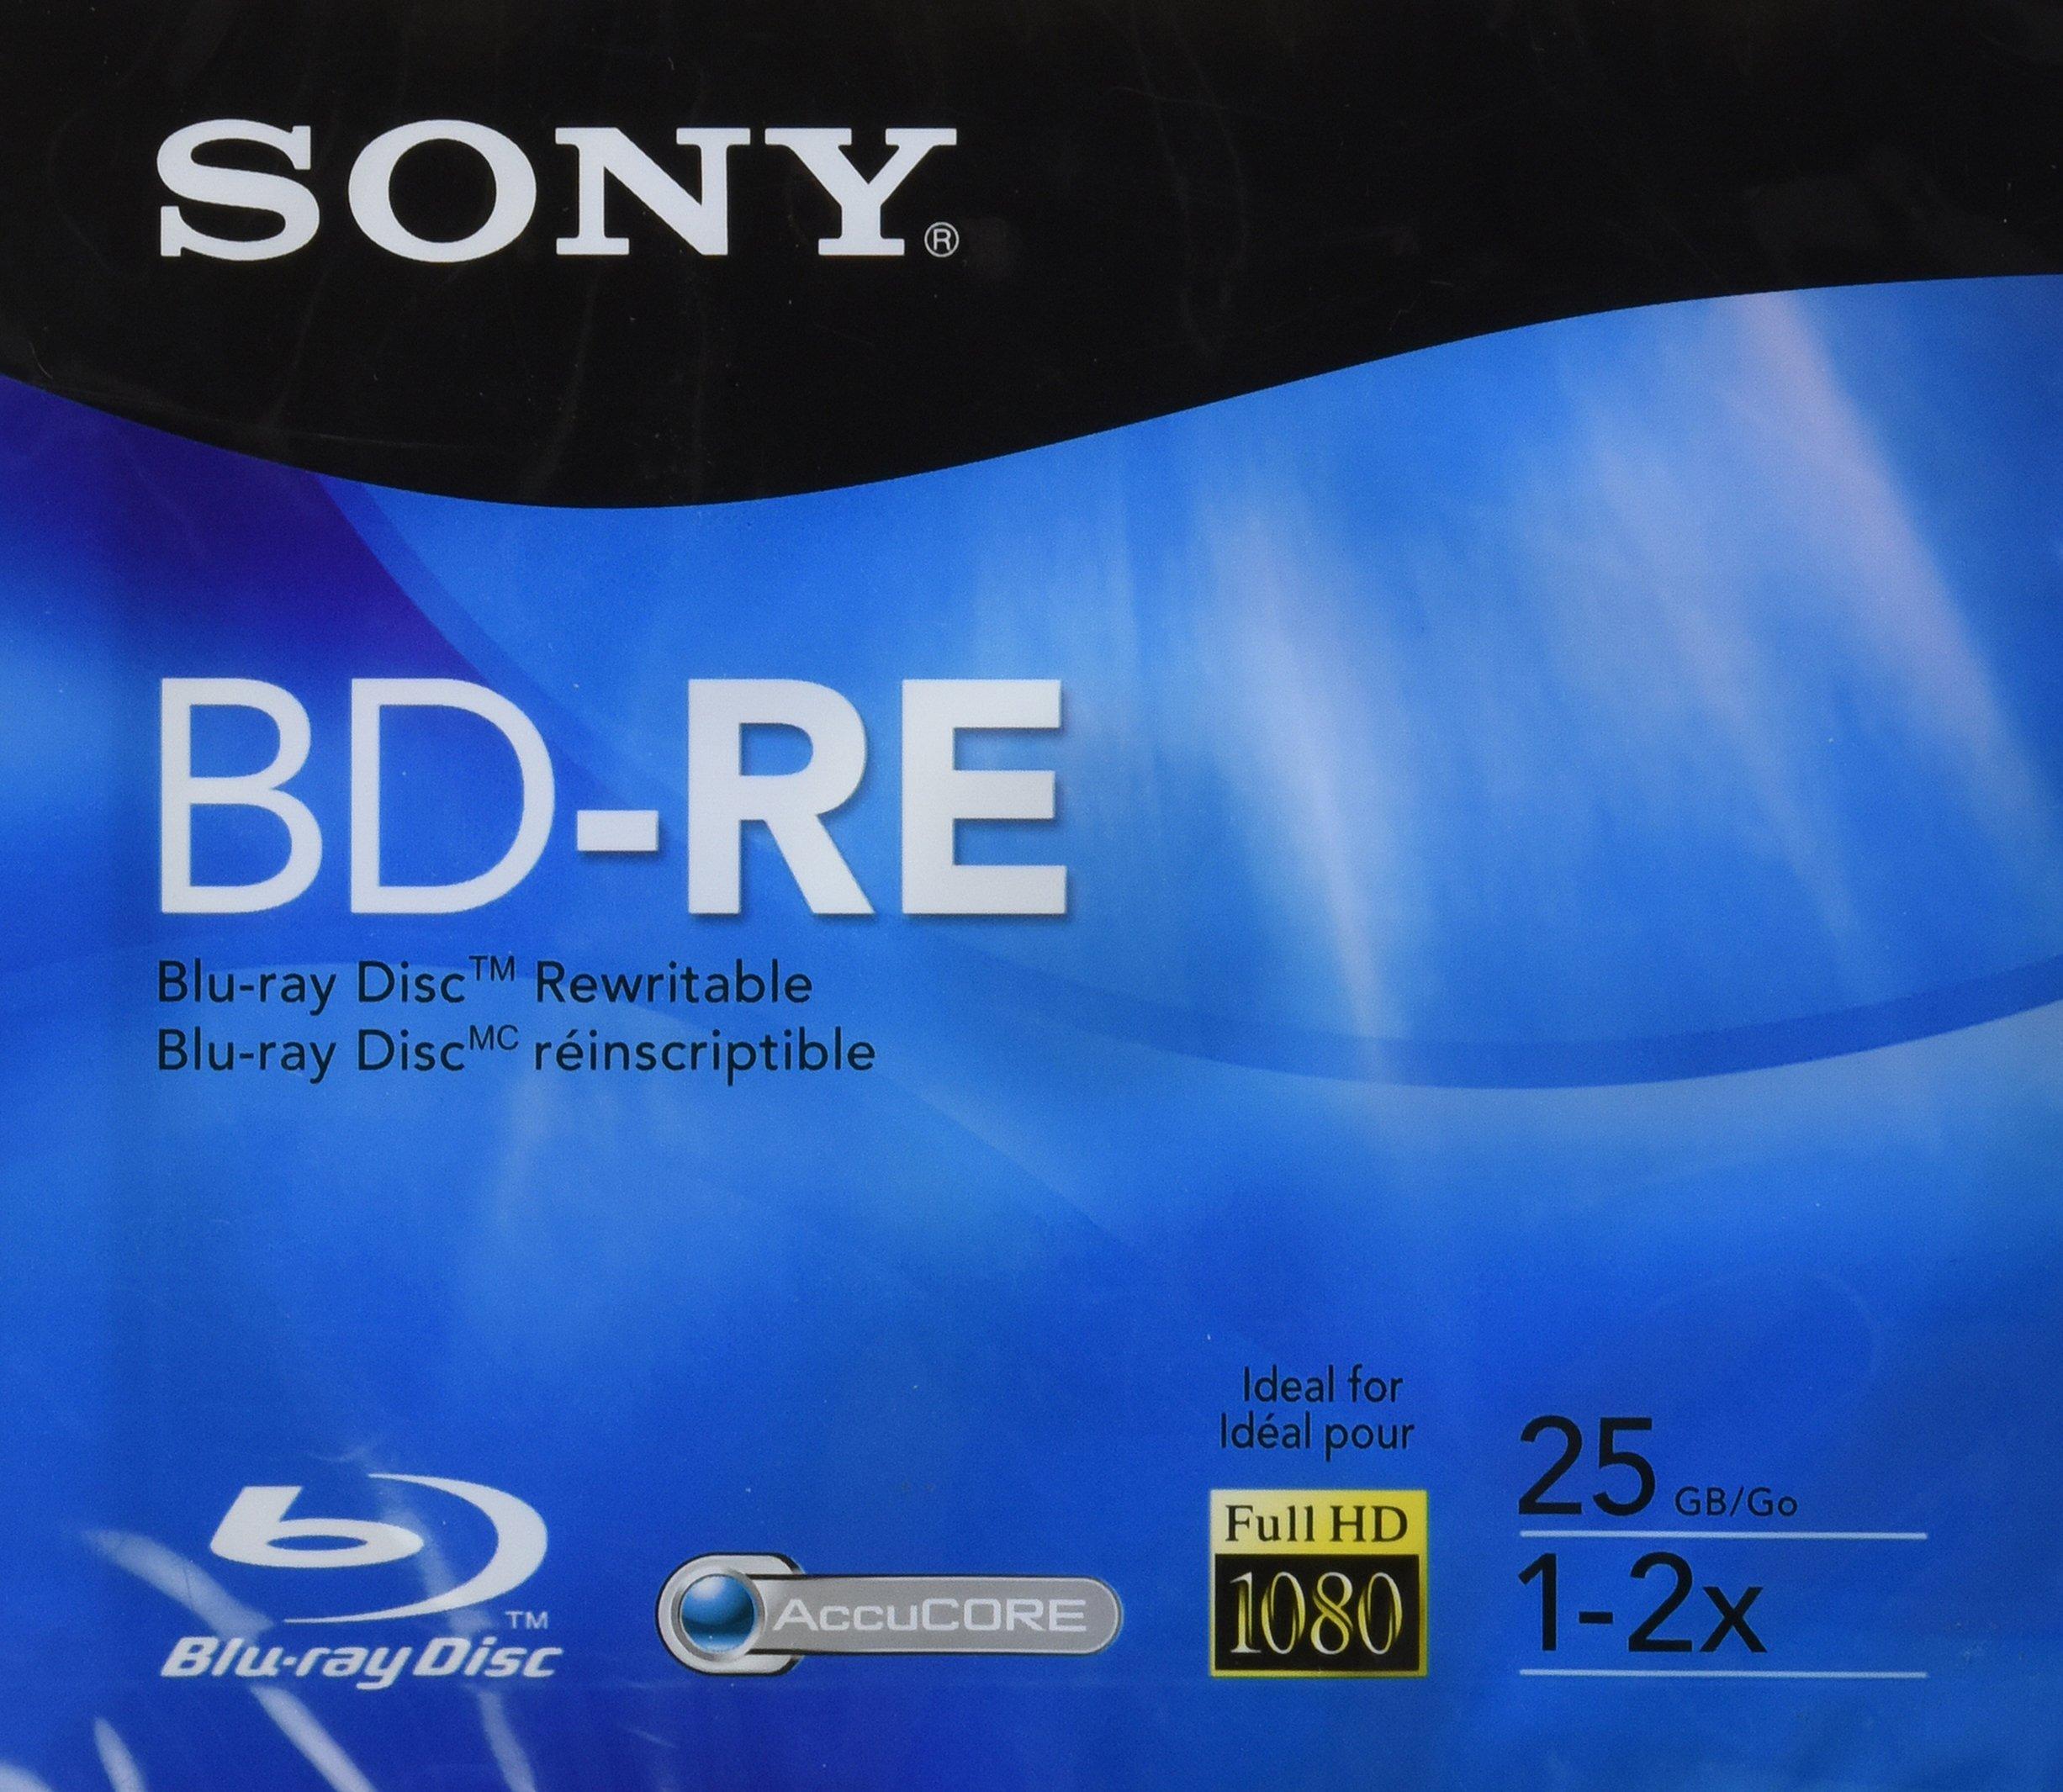 Sony BD-RE Rewritable Single Layer Disc - 25gb, 2X